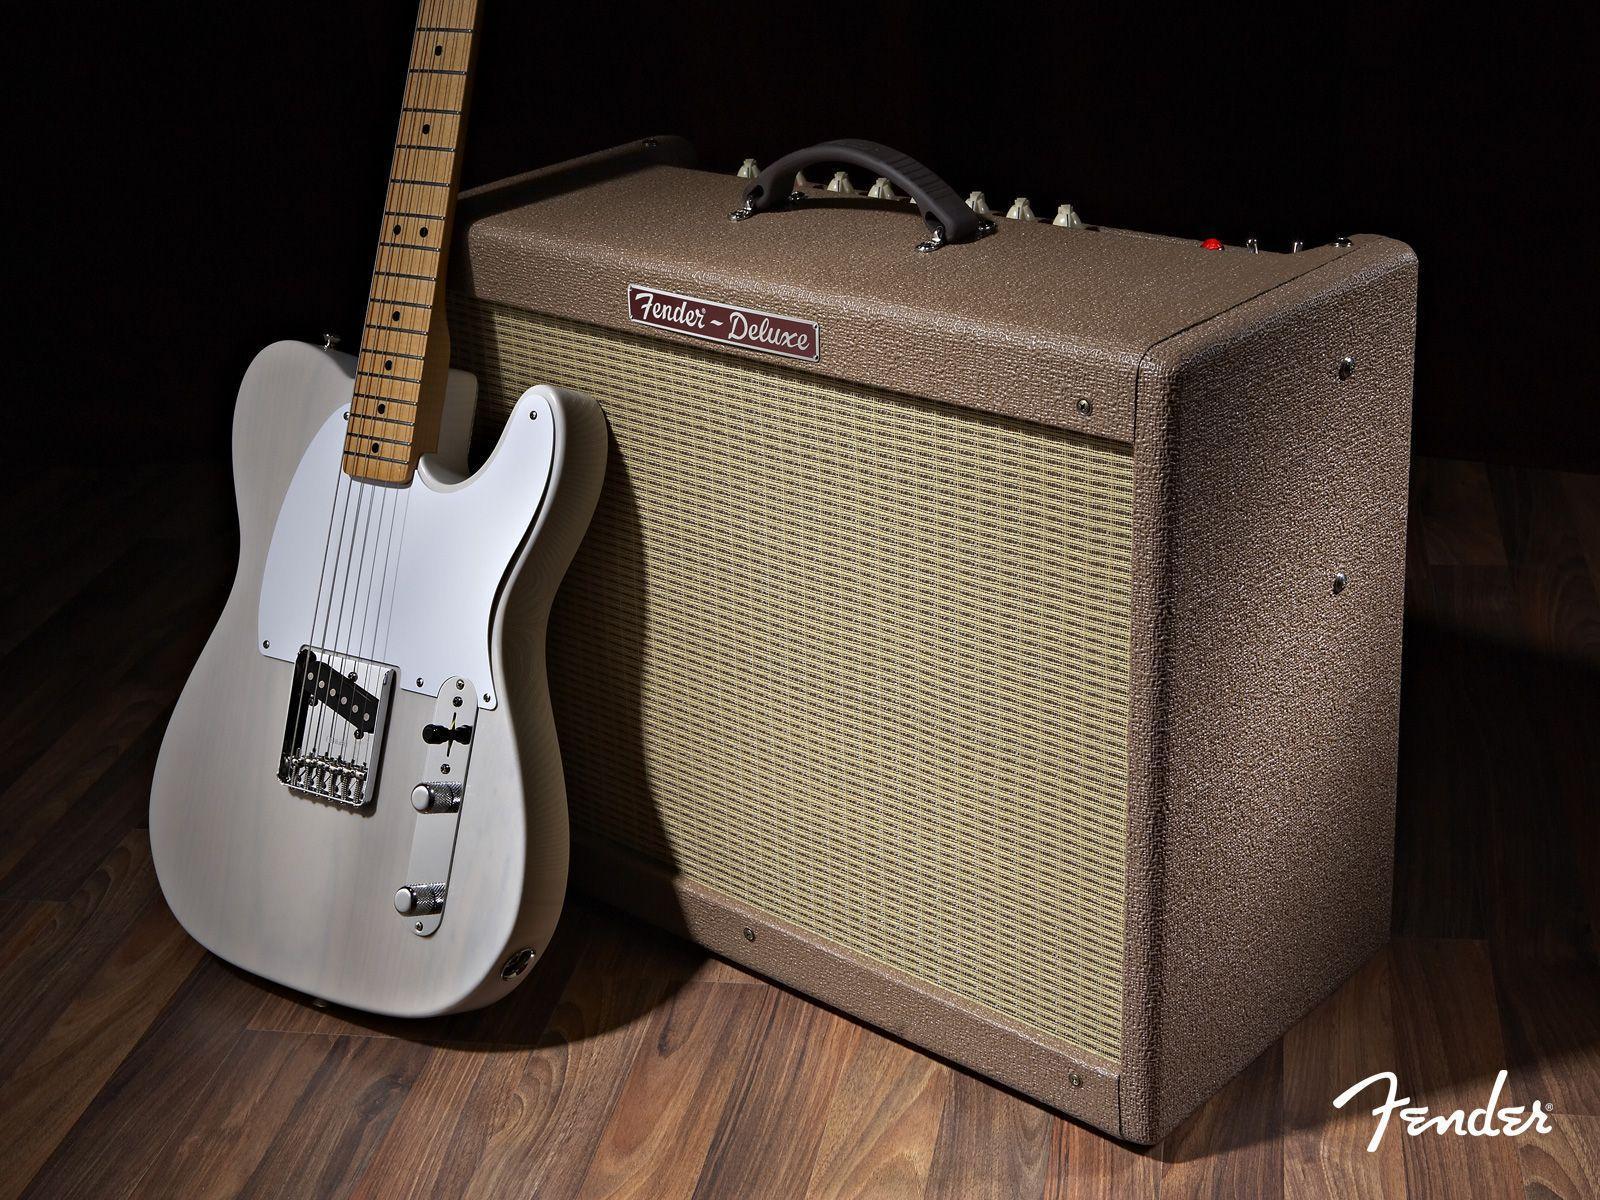 Fender Telecaster Wallpapers 1600x1200